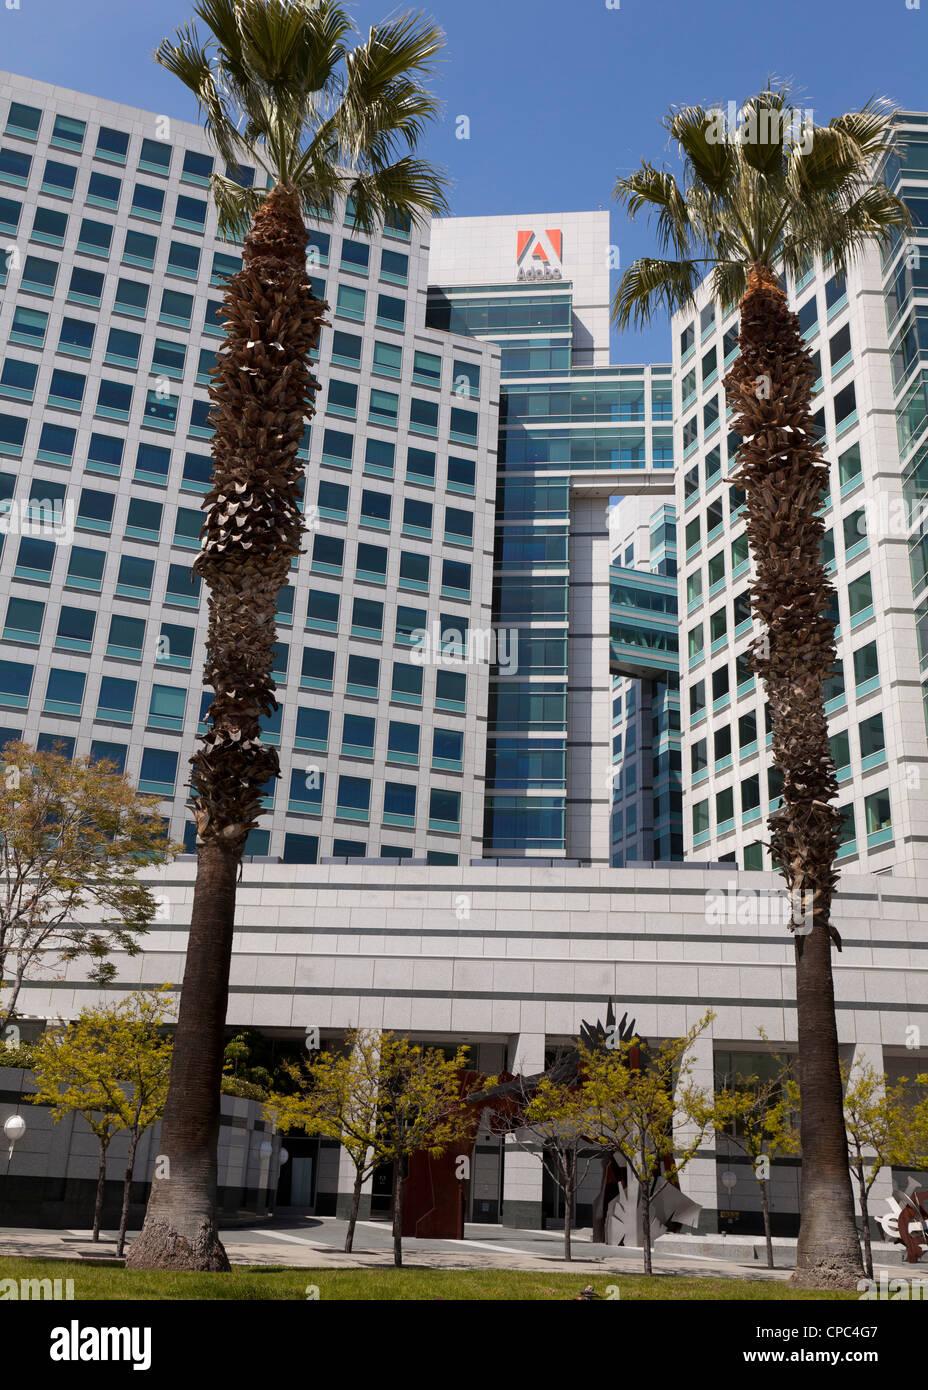 Adobe headquarters building in San Jose, California - Stock Image